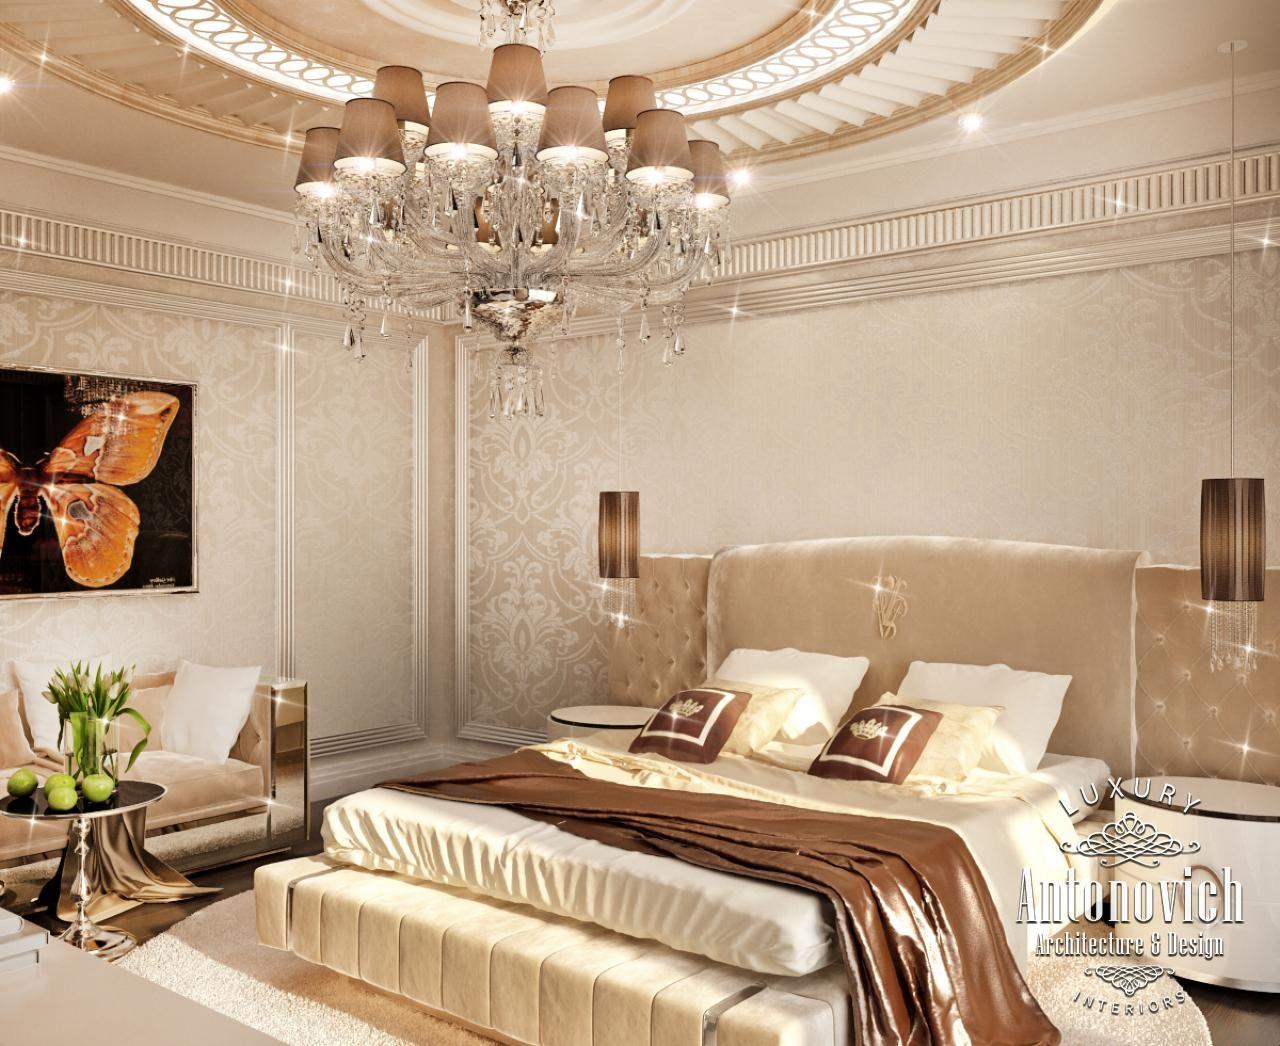 Foyer Decor Abu Dhabi : Villa interio… antonovich home interior design elegant